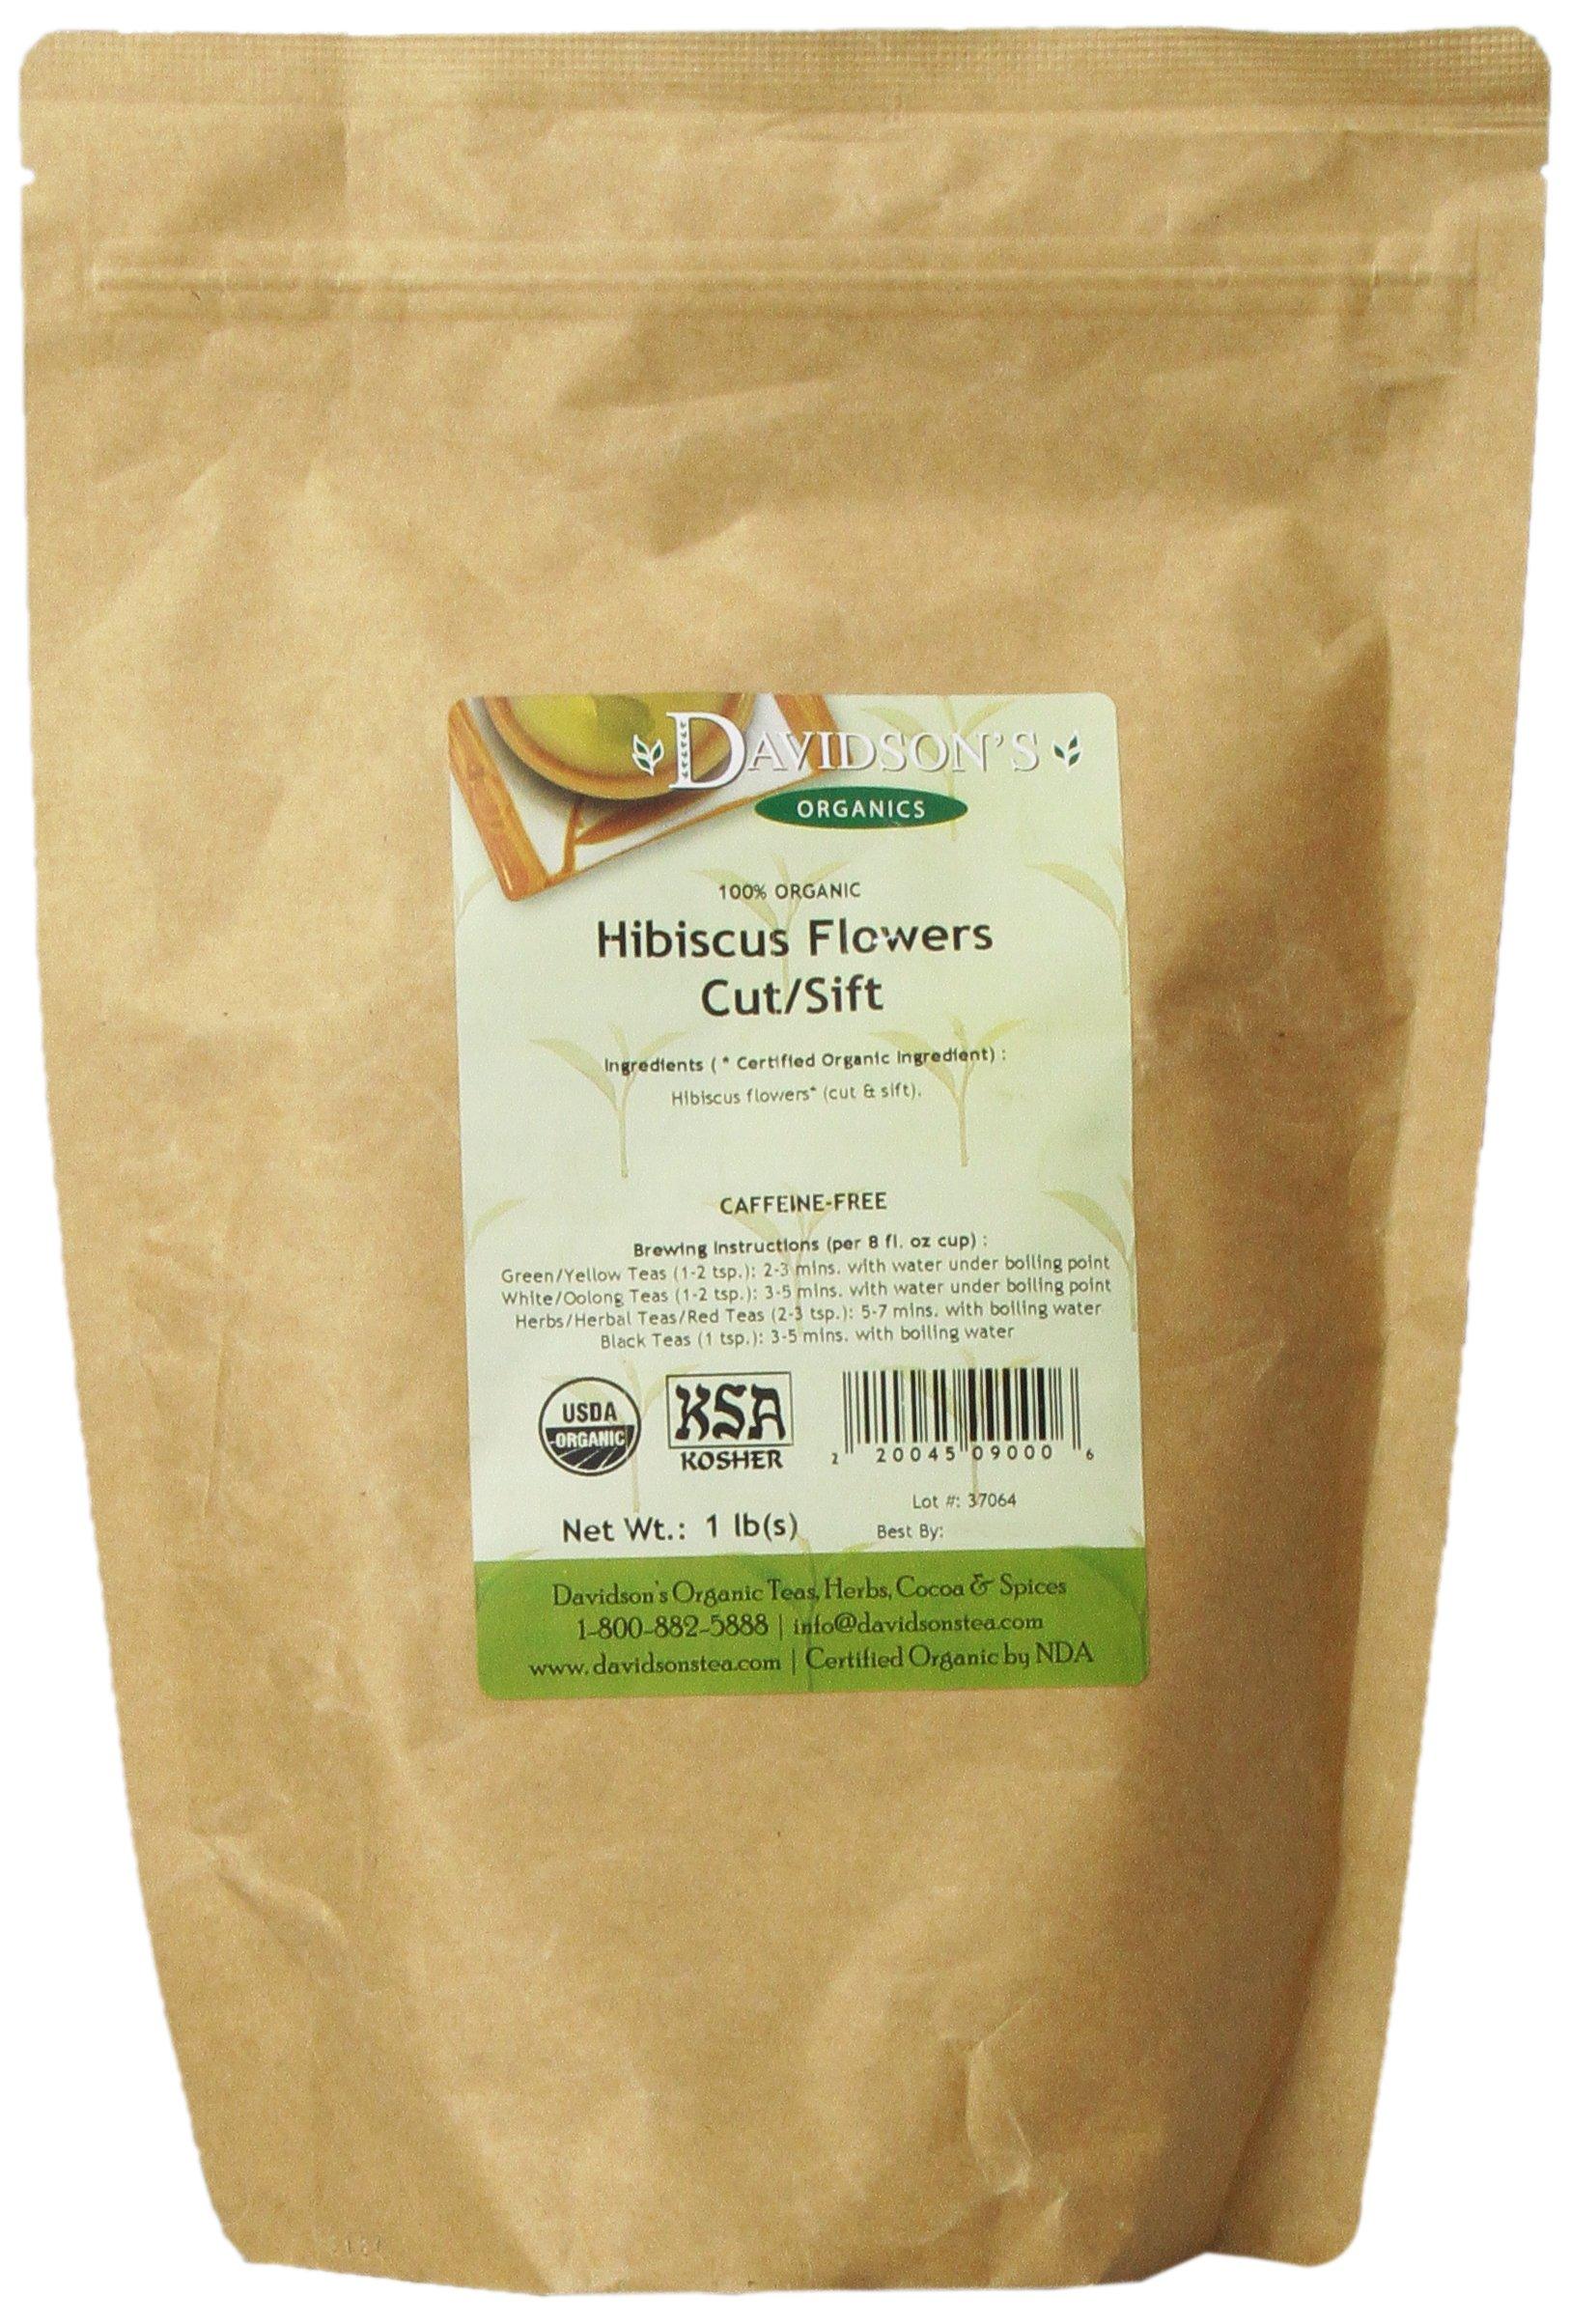 Davidson's Tea Bulk, Organic Hibiscus Flowers Cut and Sifted, 16 Ounce